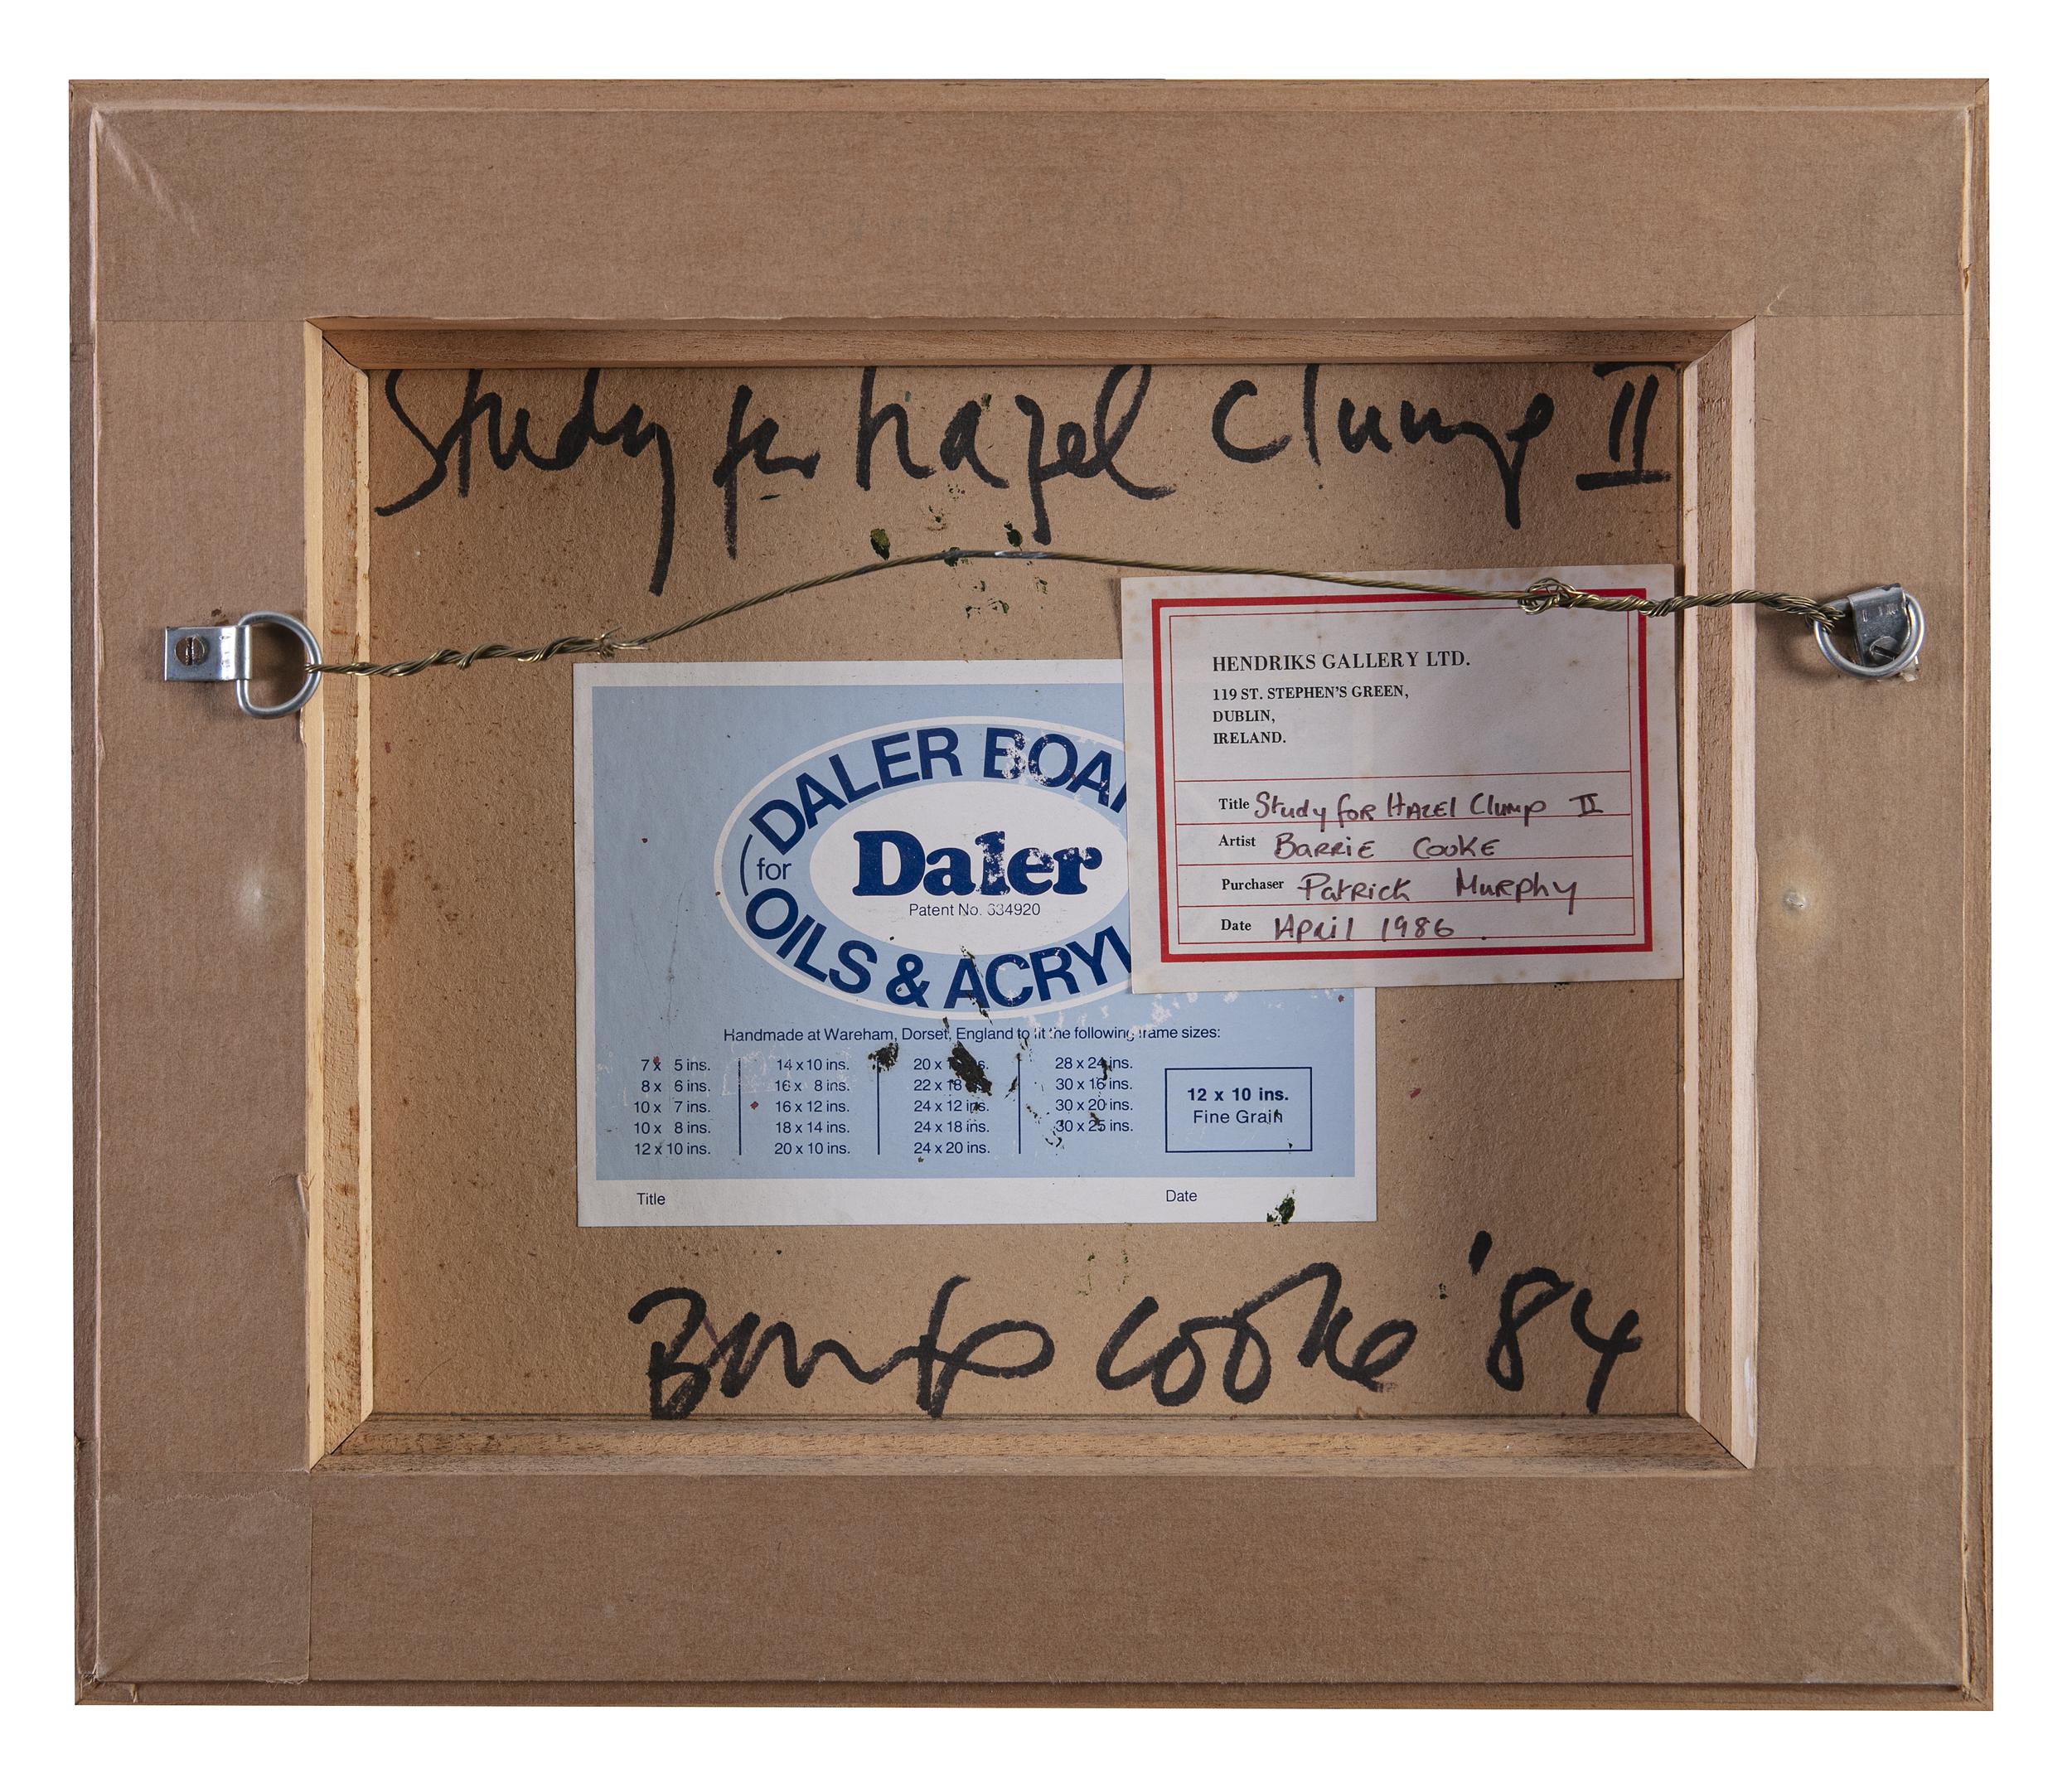 Lot 17 - Barrie Cooke HRHA (1931-2014)Study for Hazel Clump IIOil on board, 25.5 x 30.5cm (10 x 12)Signed,